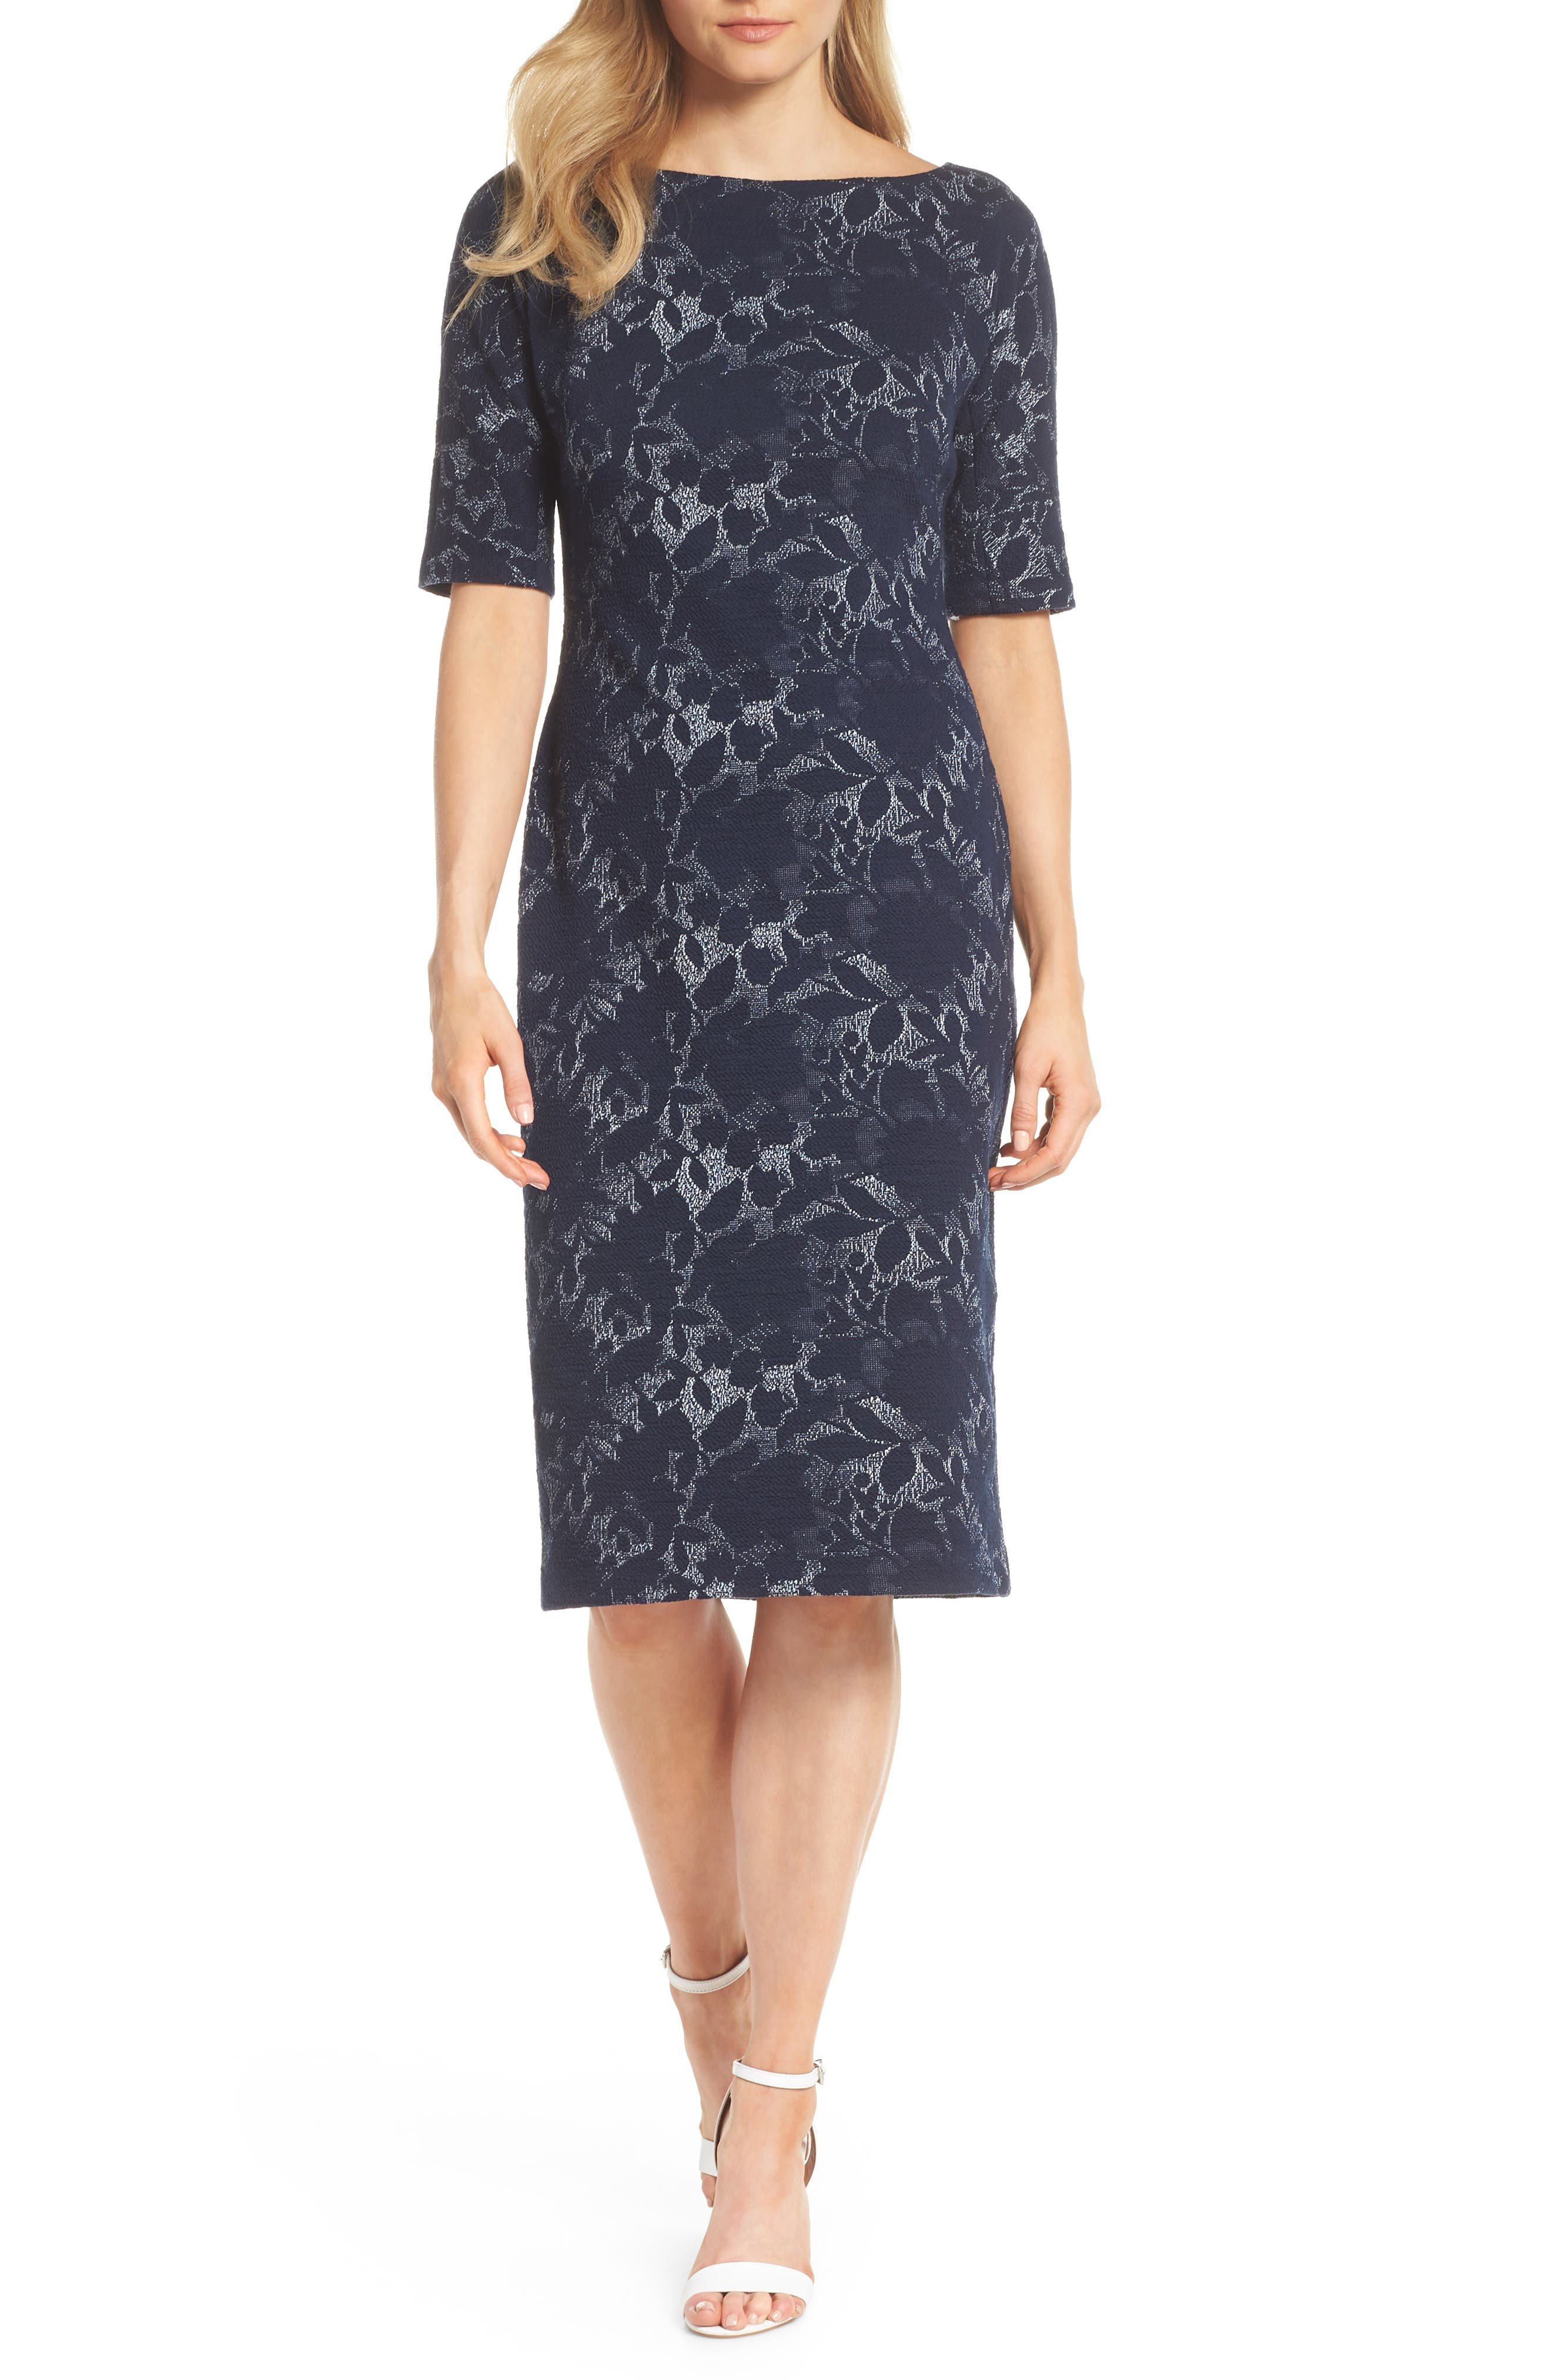 MAGGY LONDON,                             Jacquard Pencil Dress,                             Main thumbnail 1, color,                             462